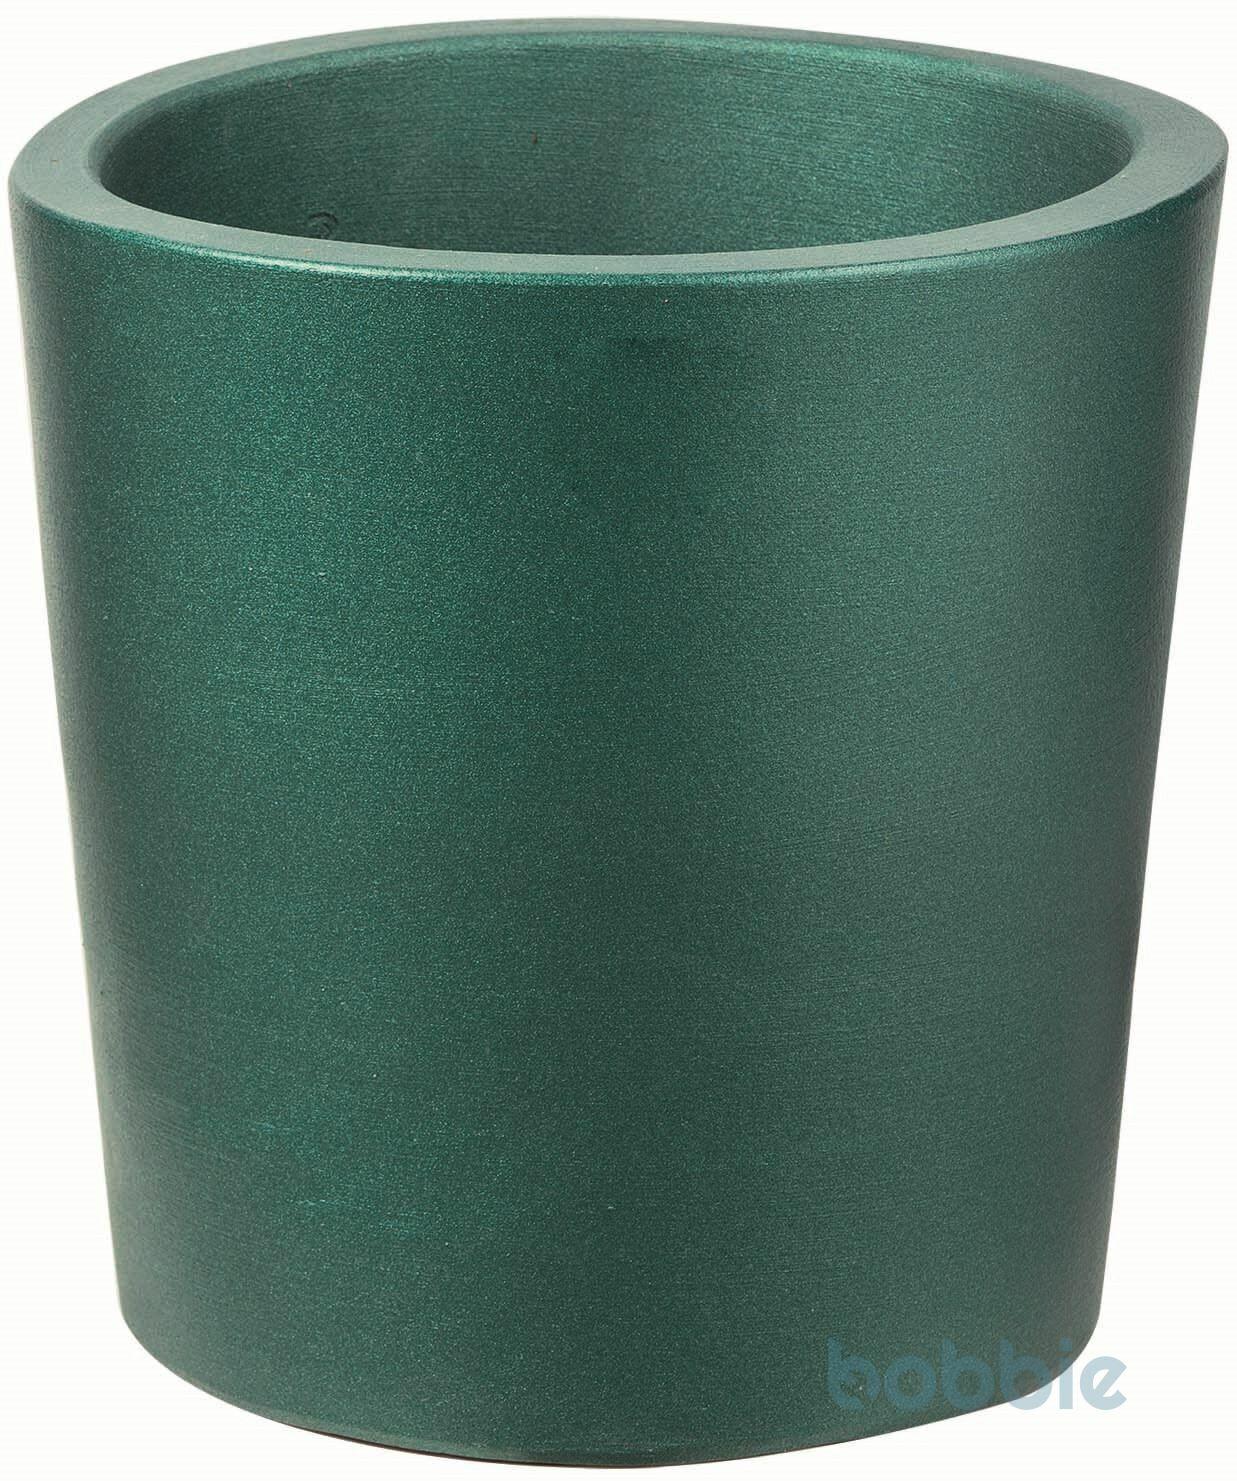 Blumentopf runde Vase modern - VASO ROTONDO MODERNE CM.40 - PREMIUM LIFE - EMERALD